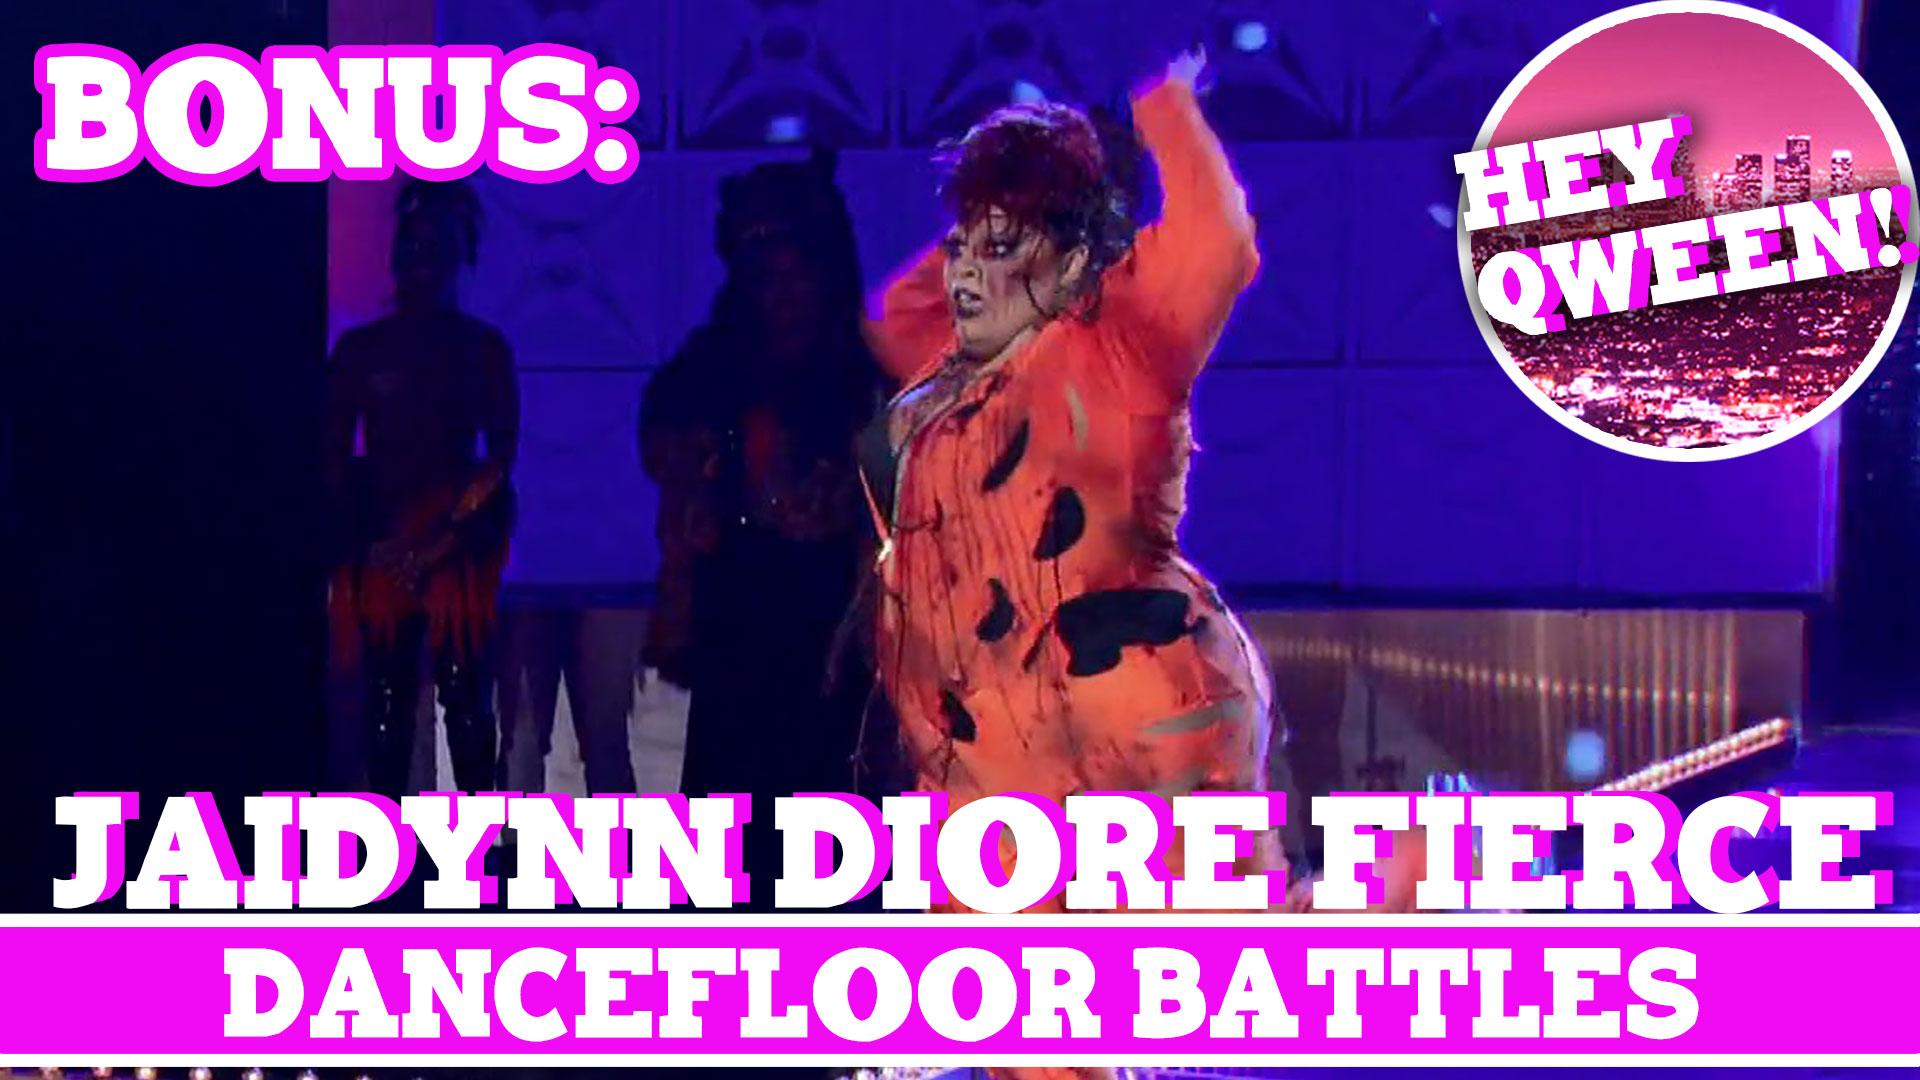 Hey Qween! BONUS: Jaidynn Diore Fierce's Dancefloor Battles!